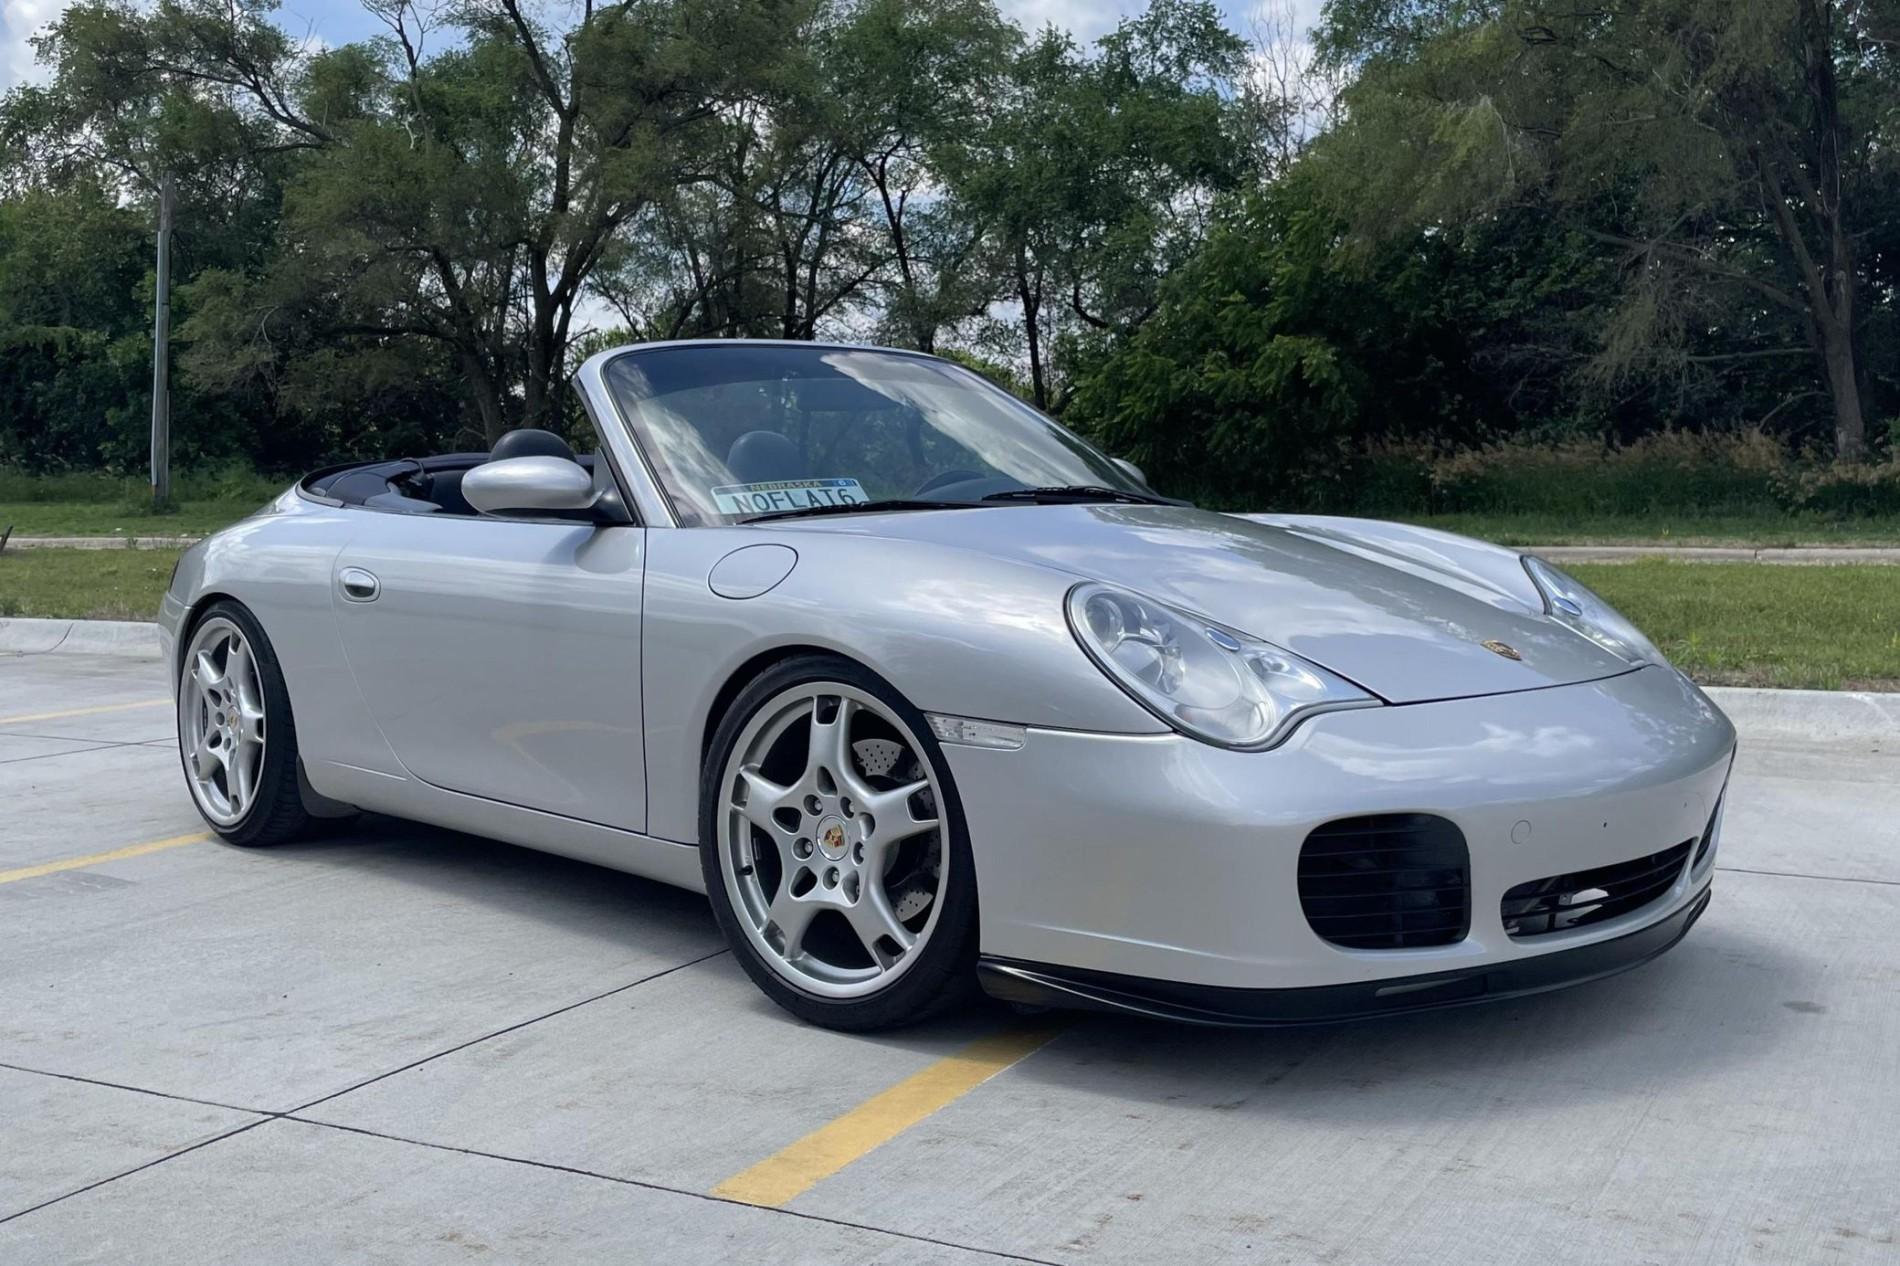 Porsche 911 Carrera cu motor V8 - Porsche 911 Carrera cu motor V8